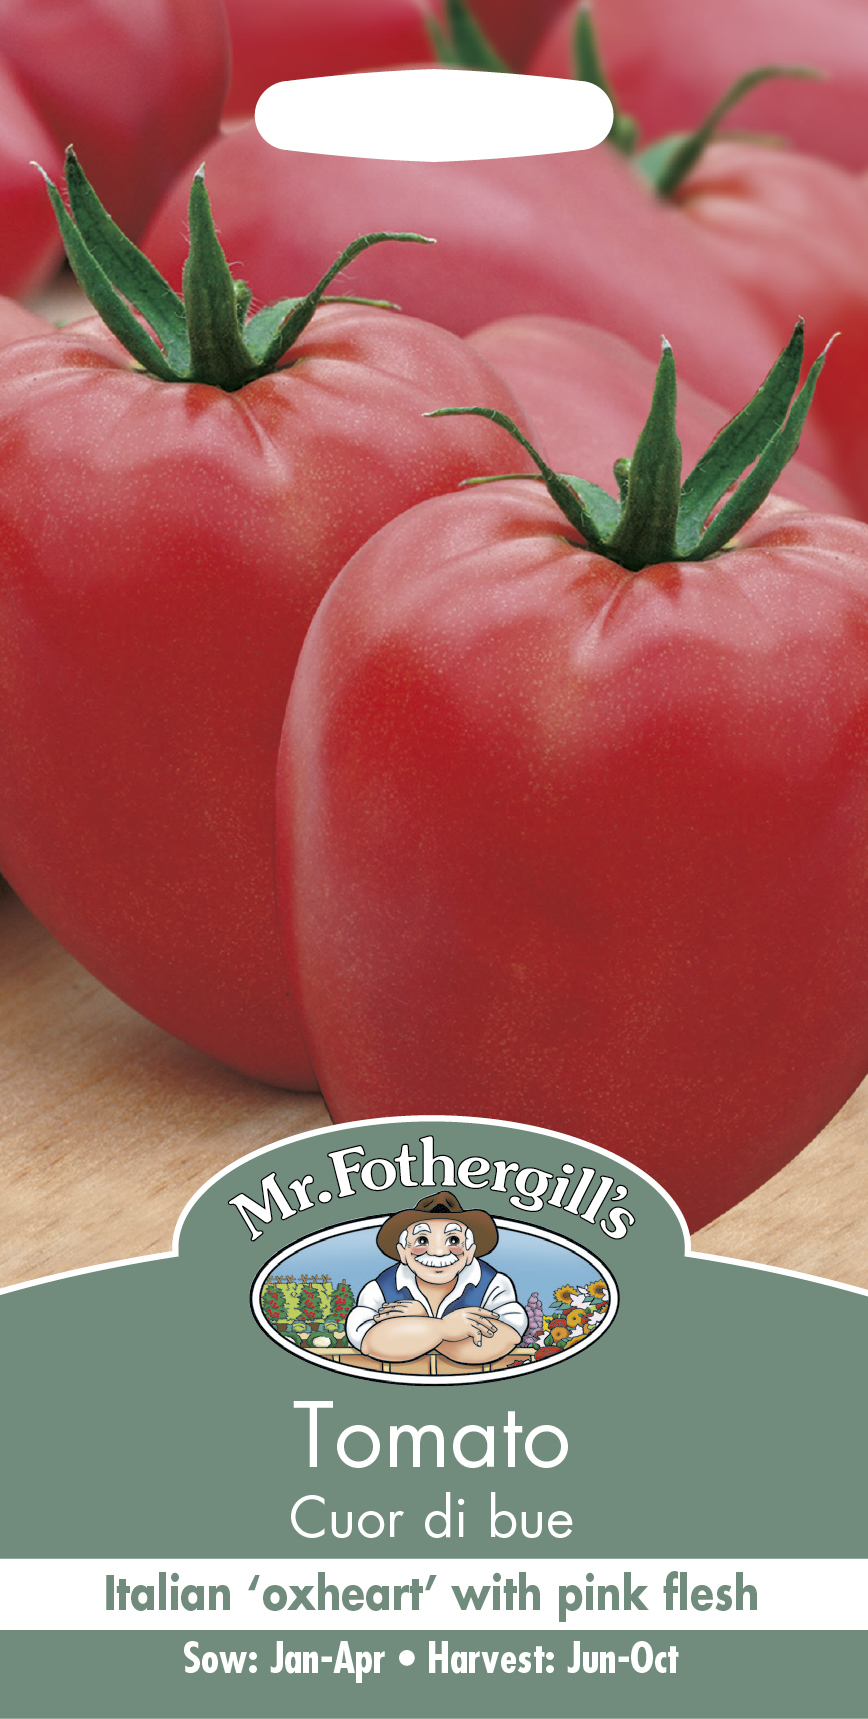 Biff-, Tomat 'Cuor di Bue